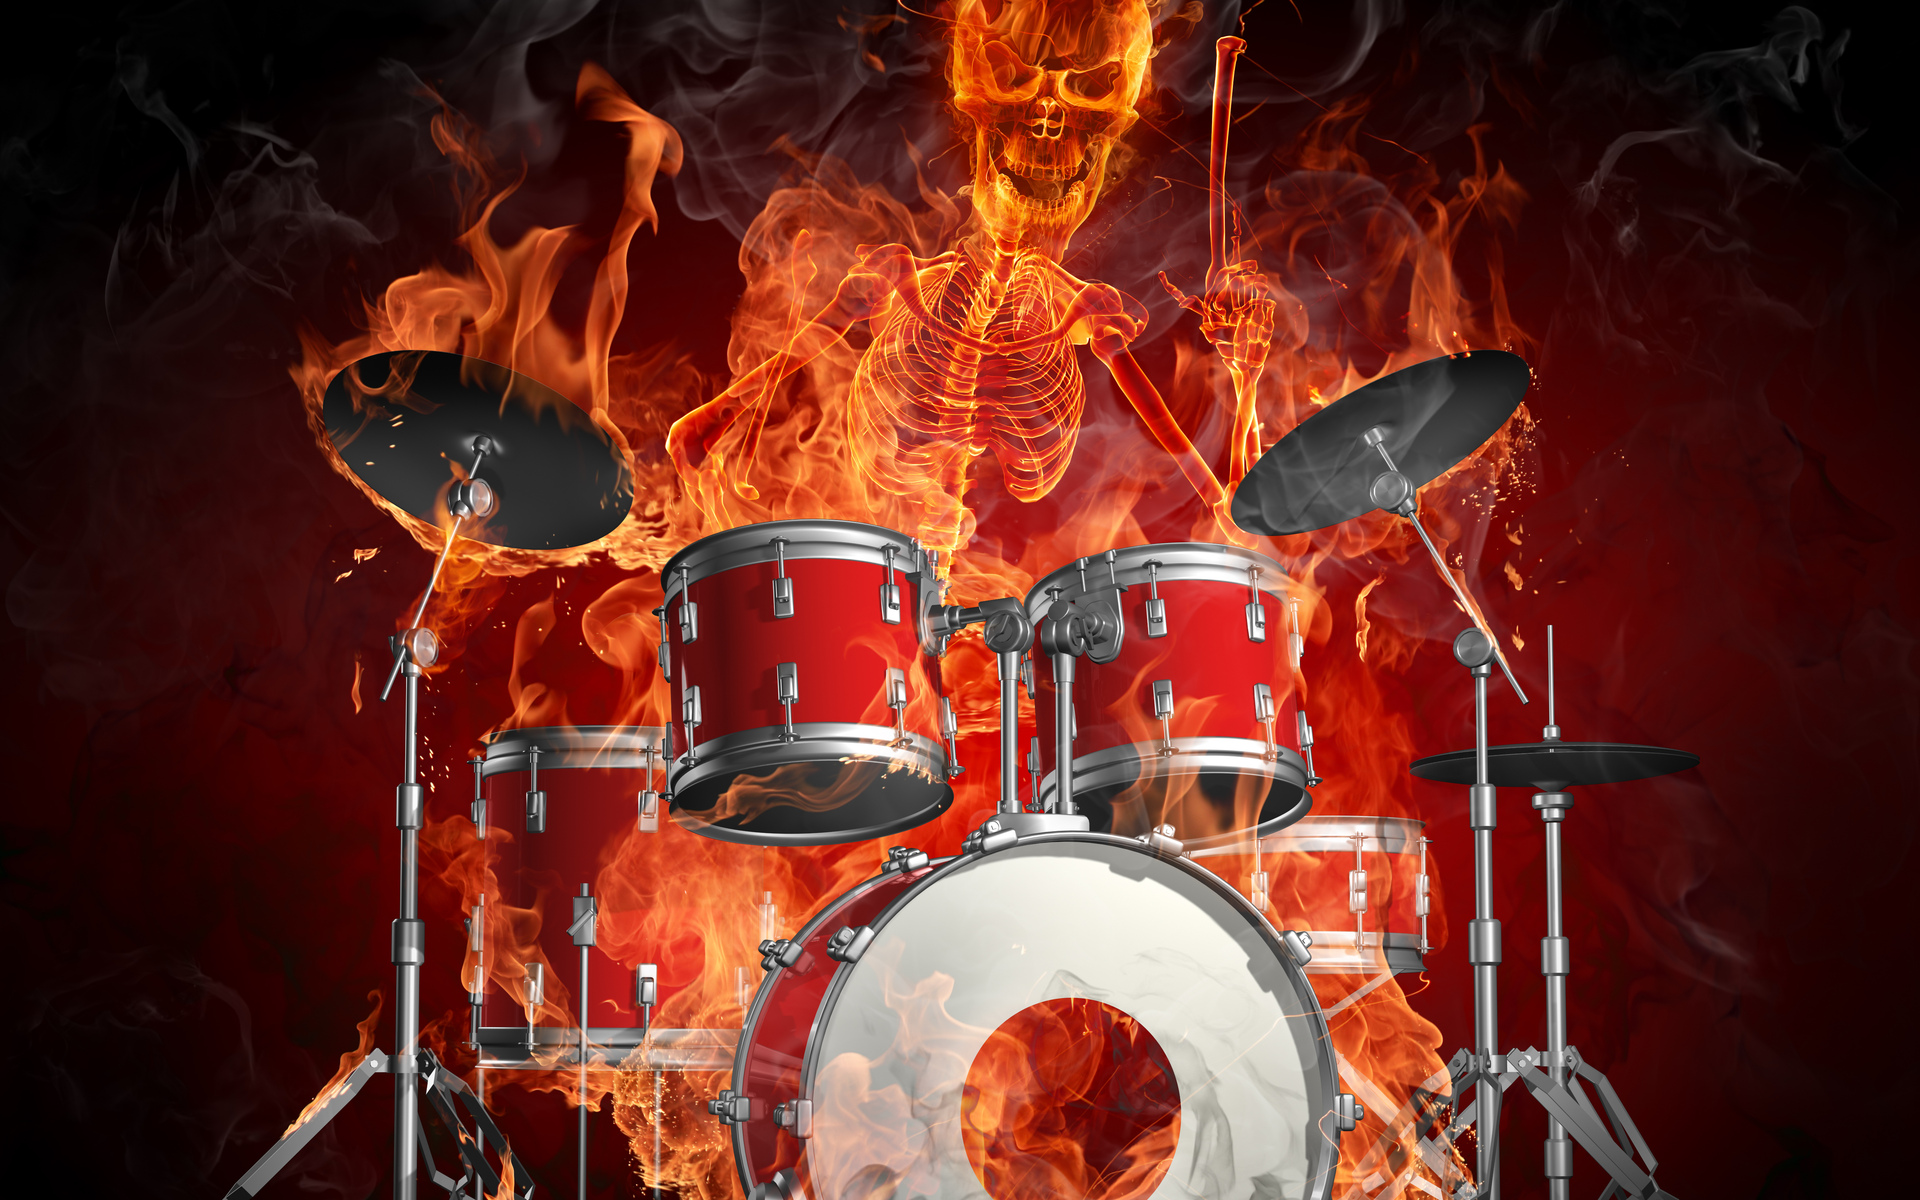 Flames Drums Fire Skeleton Dark Wallpaper